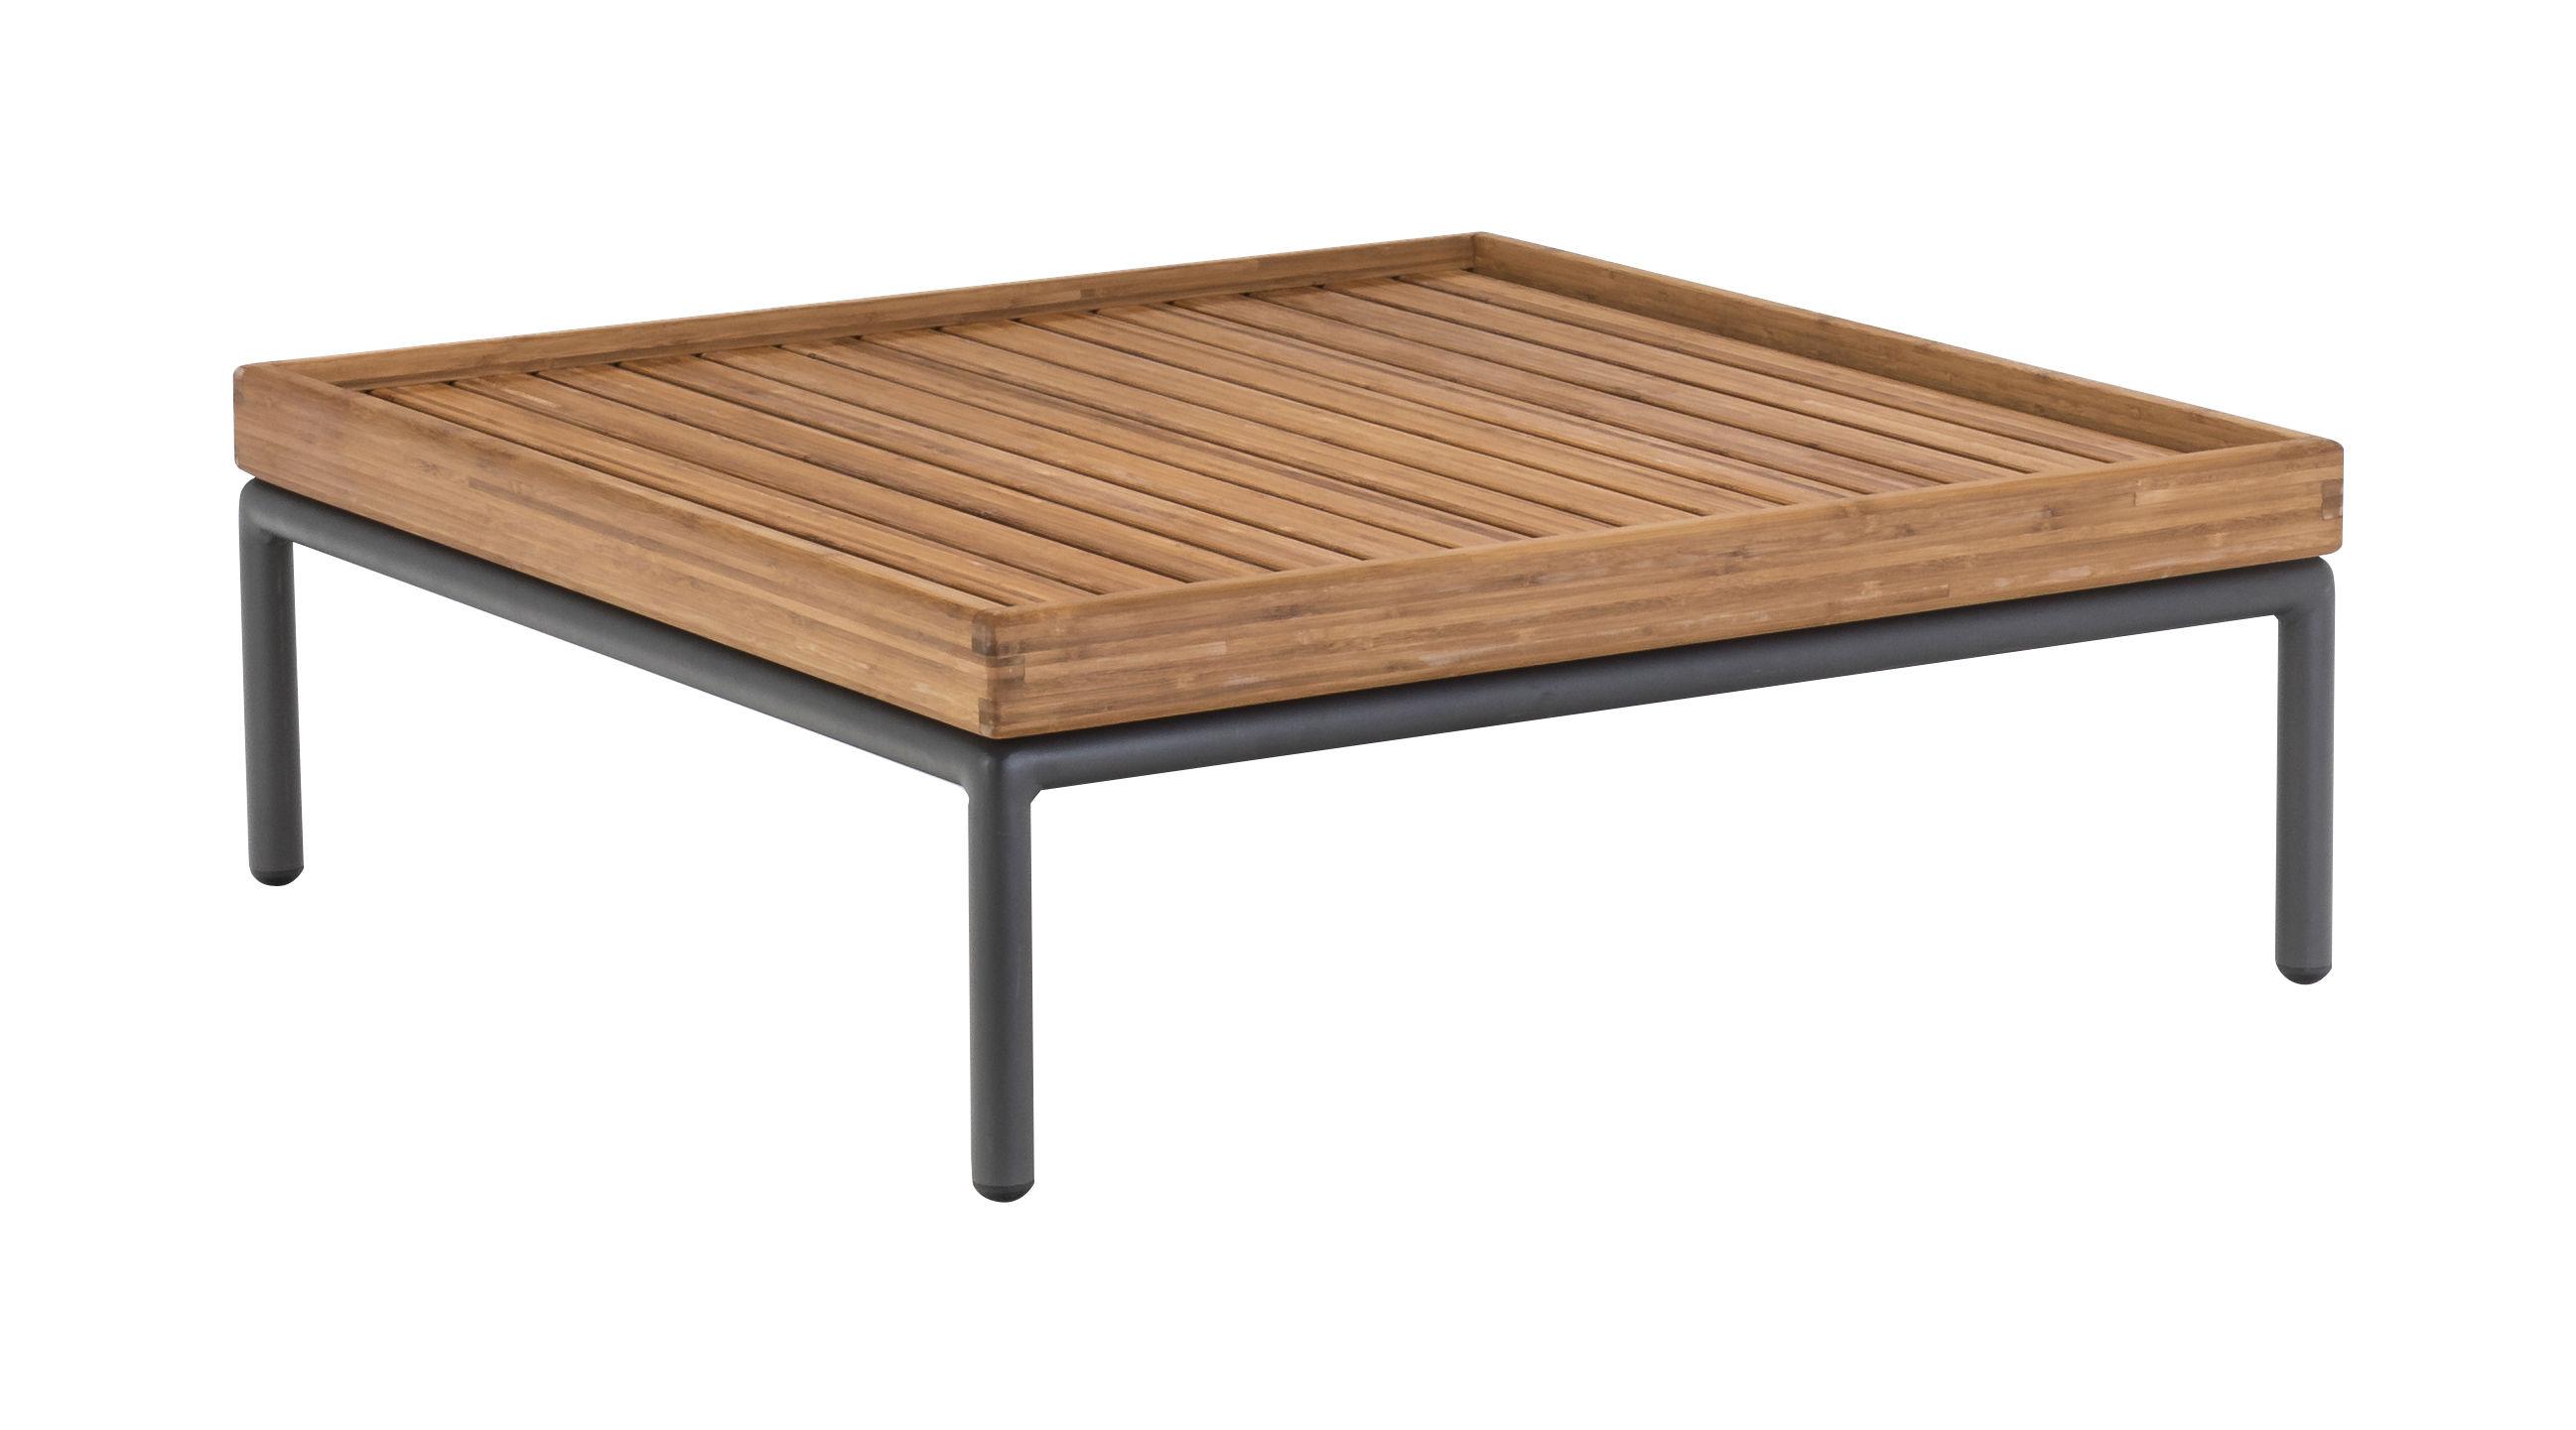 Arredamento - Tavolini  - Tavolino basso Level / 81 x 81 cm - Bambù - Houe - Bambù / Gambe grigie - Aluminium thermo-laqué, Bambù